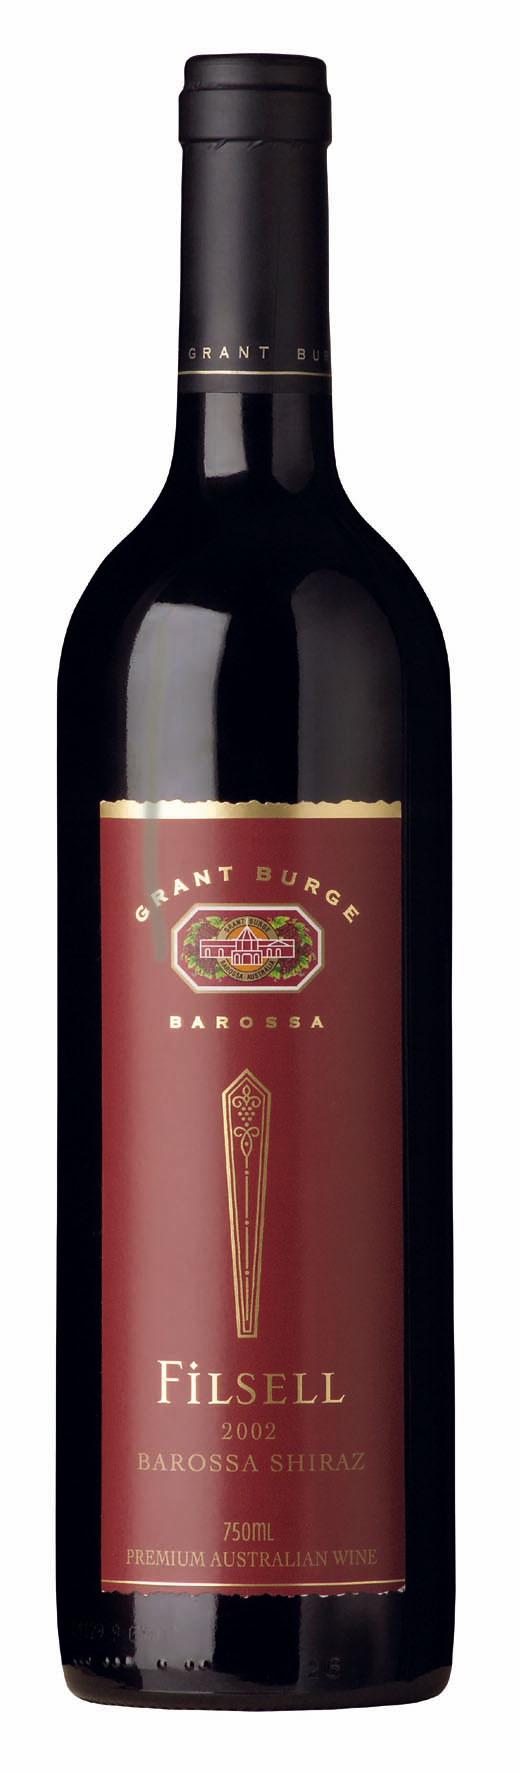 Filsell Barossa Old Vine Shiraz 2016 Grant Burge